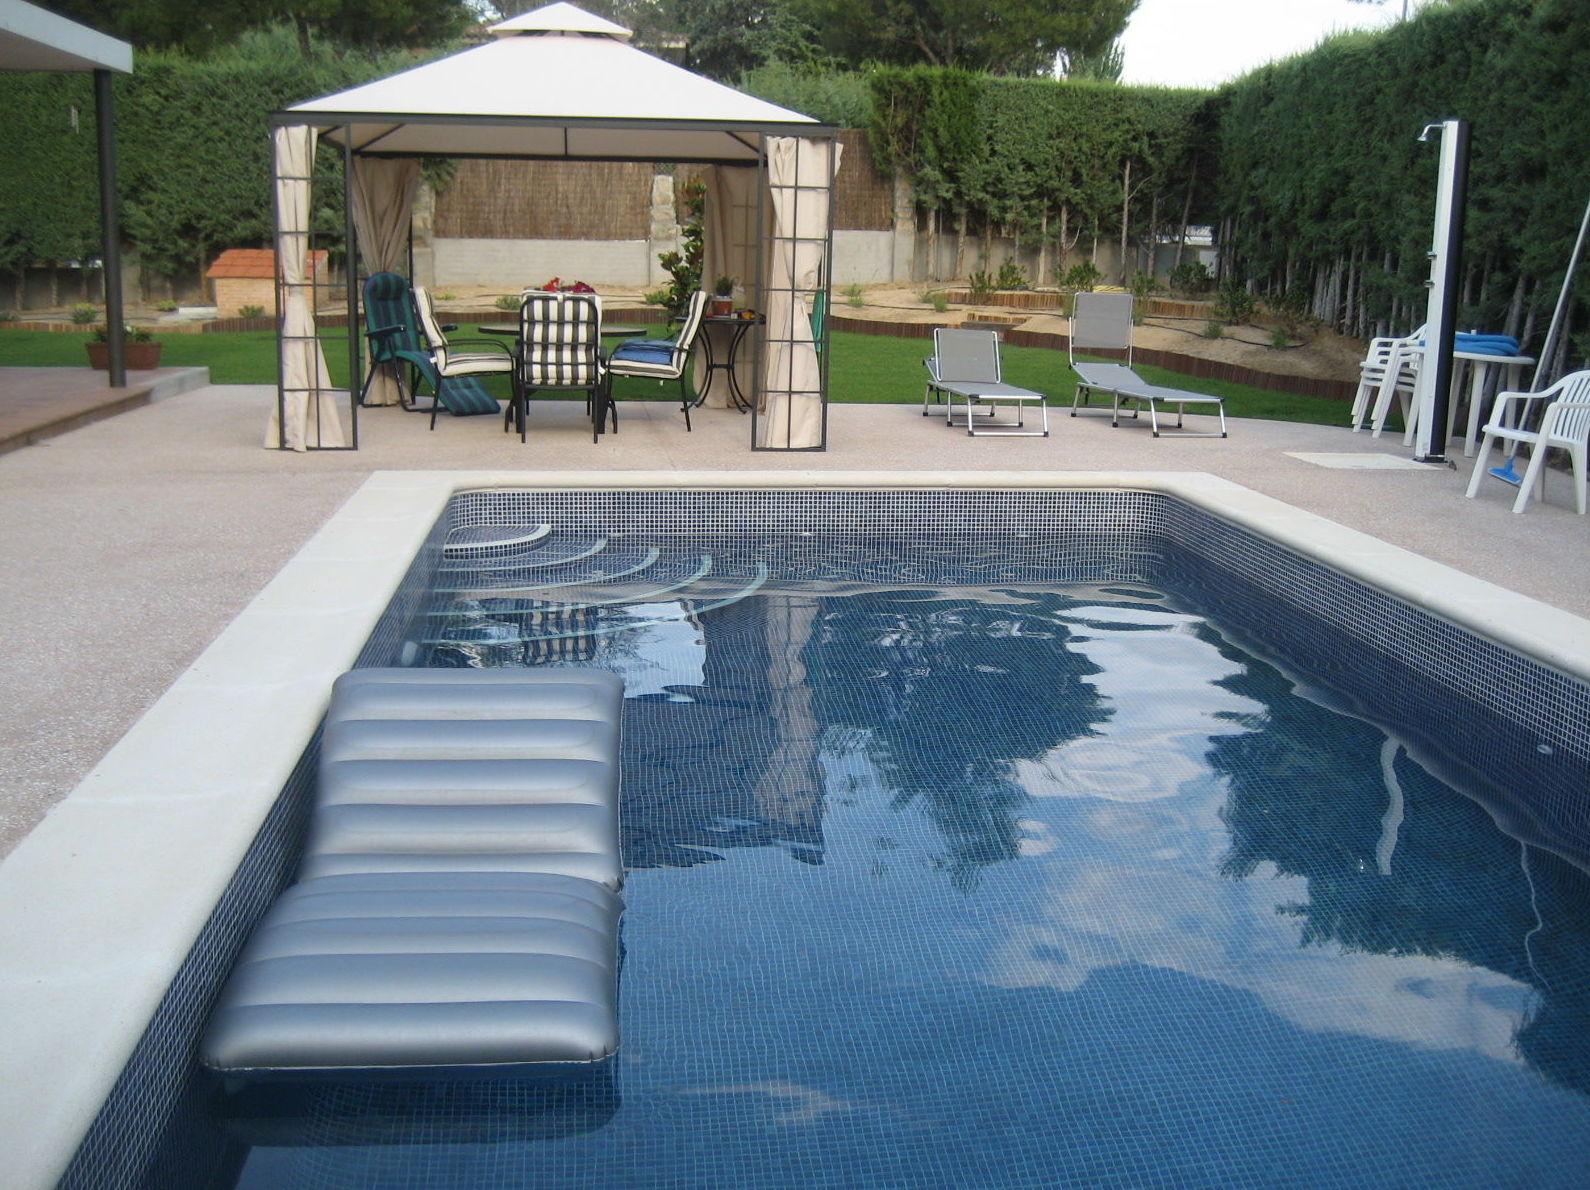 Precio piscina de obra 8x4 cheap piscinas precio for Precio piscina obra